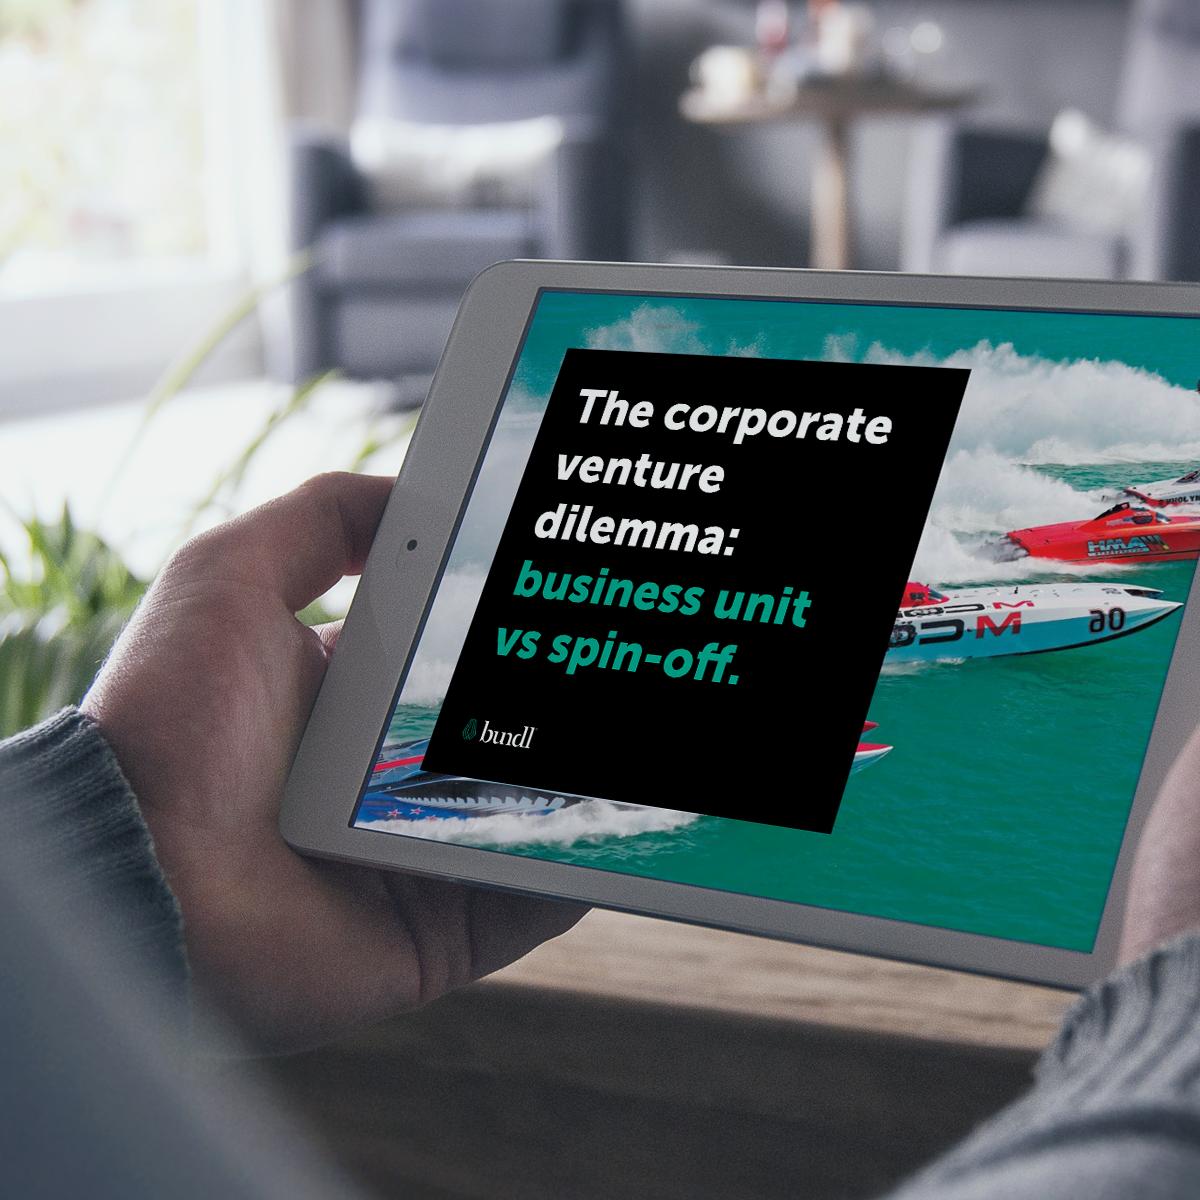 The corporate venture dilemma: spin-off vs business unit.